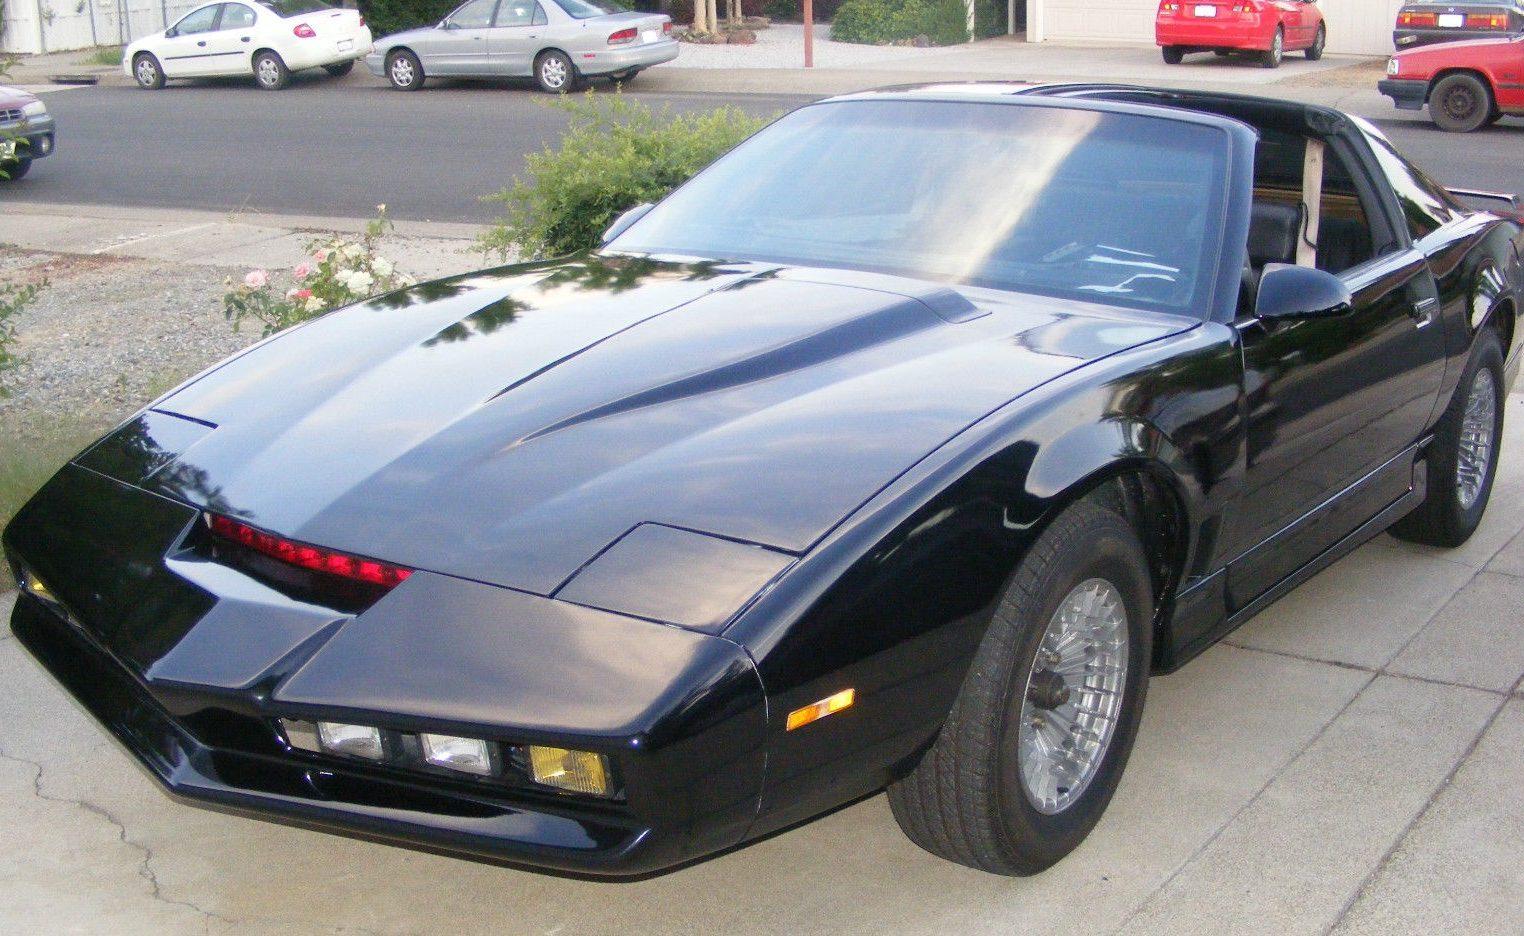 Knight Rider Car For Sale >> KITT Wannabe: 1986 Pontiac Firebird